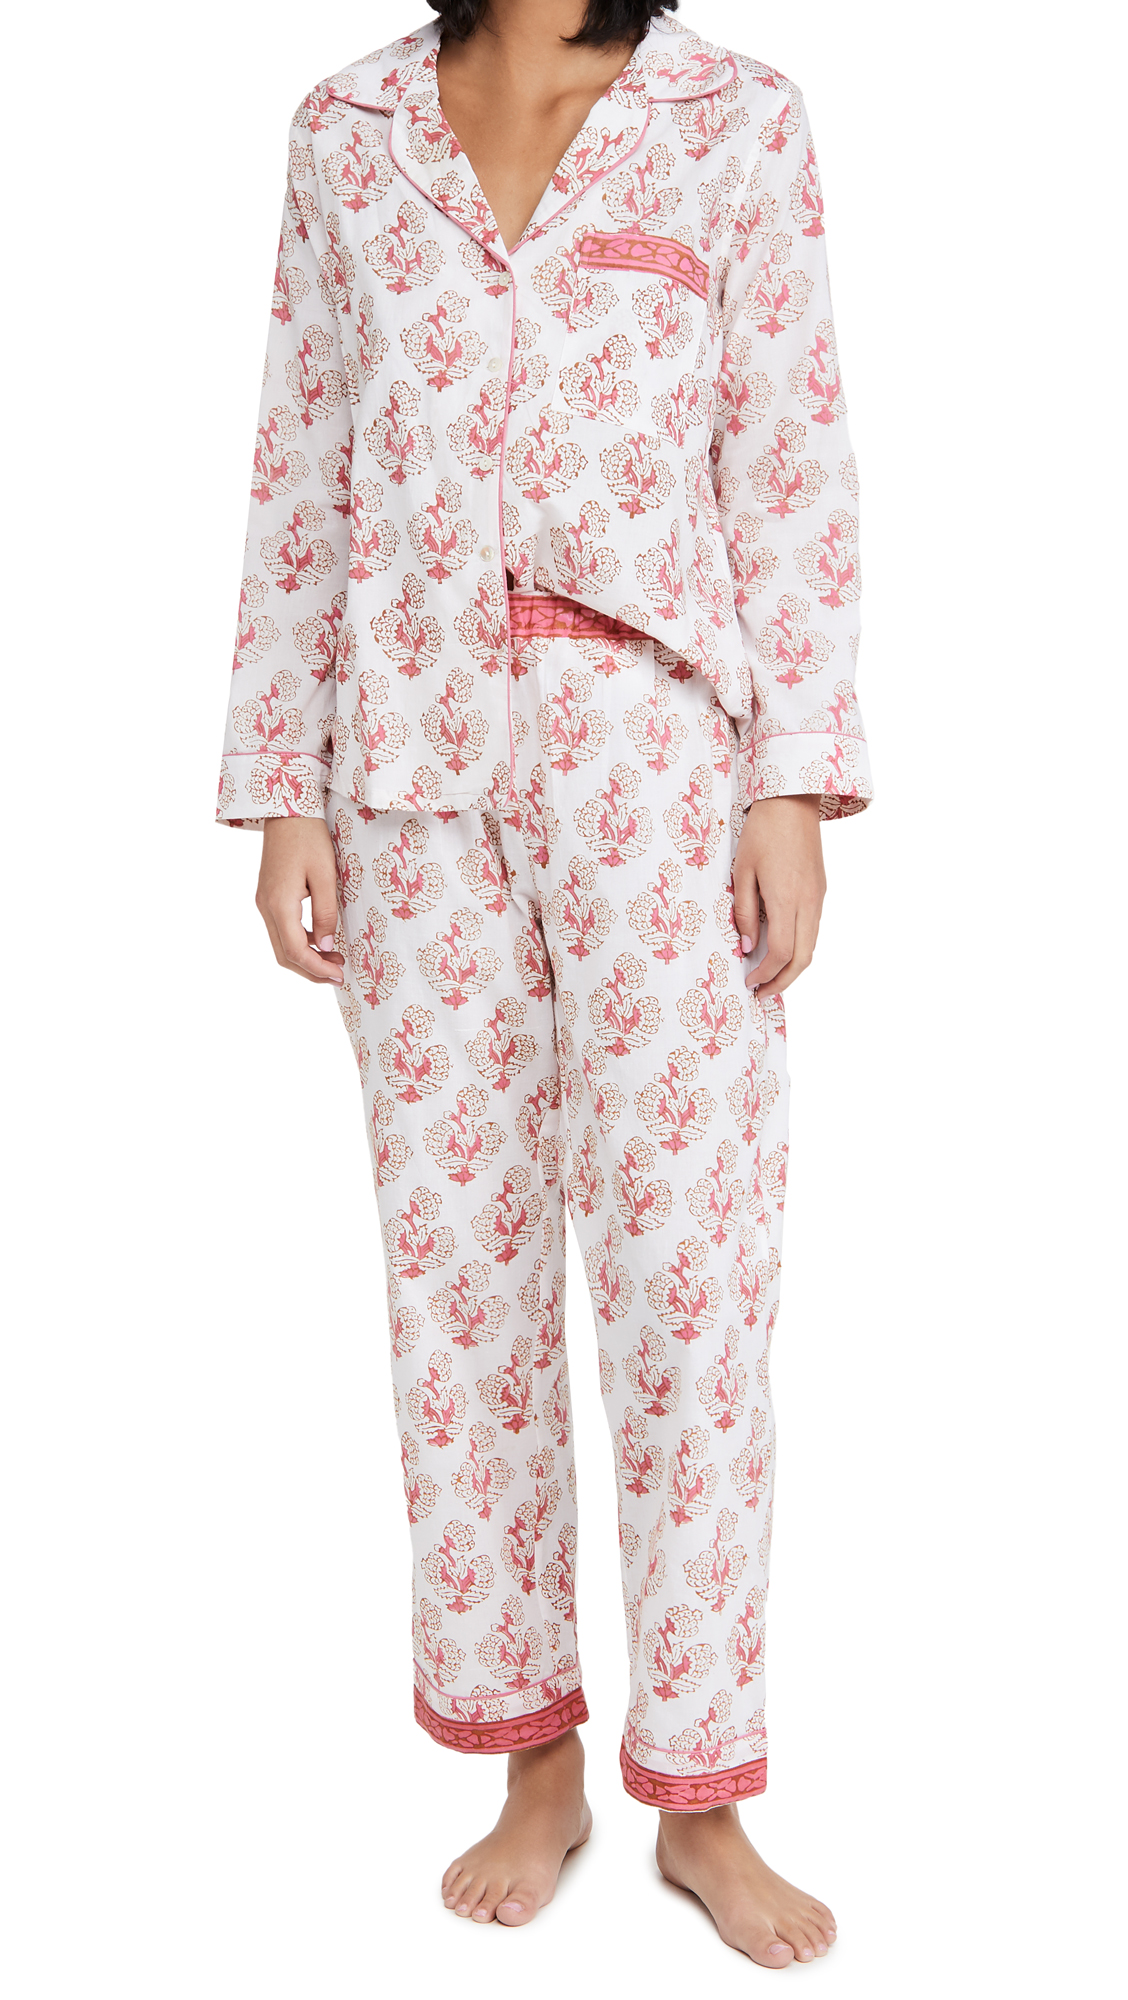 Alix of Bohemia Etoile Coralie Block Print Pajamas